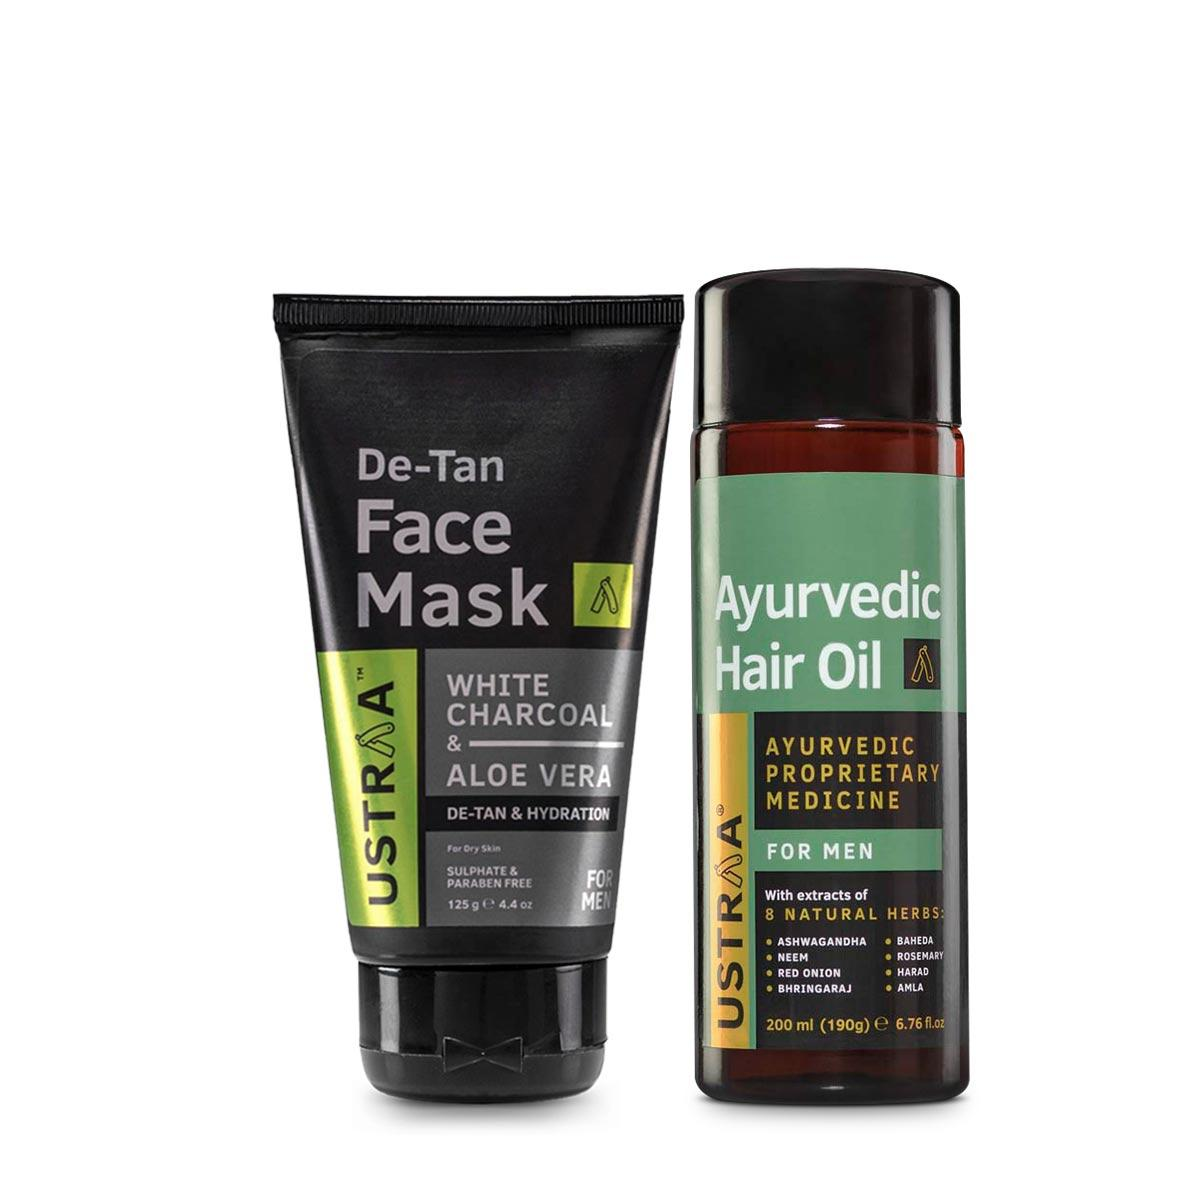 Ayurvedic Hair Oil & Face Mask- Dry Skin